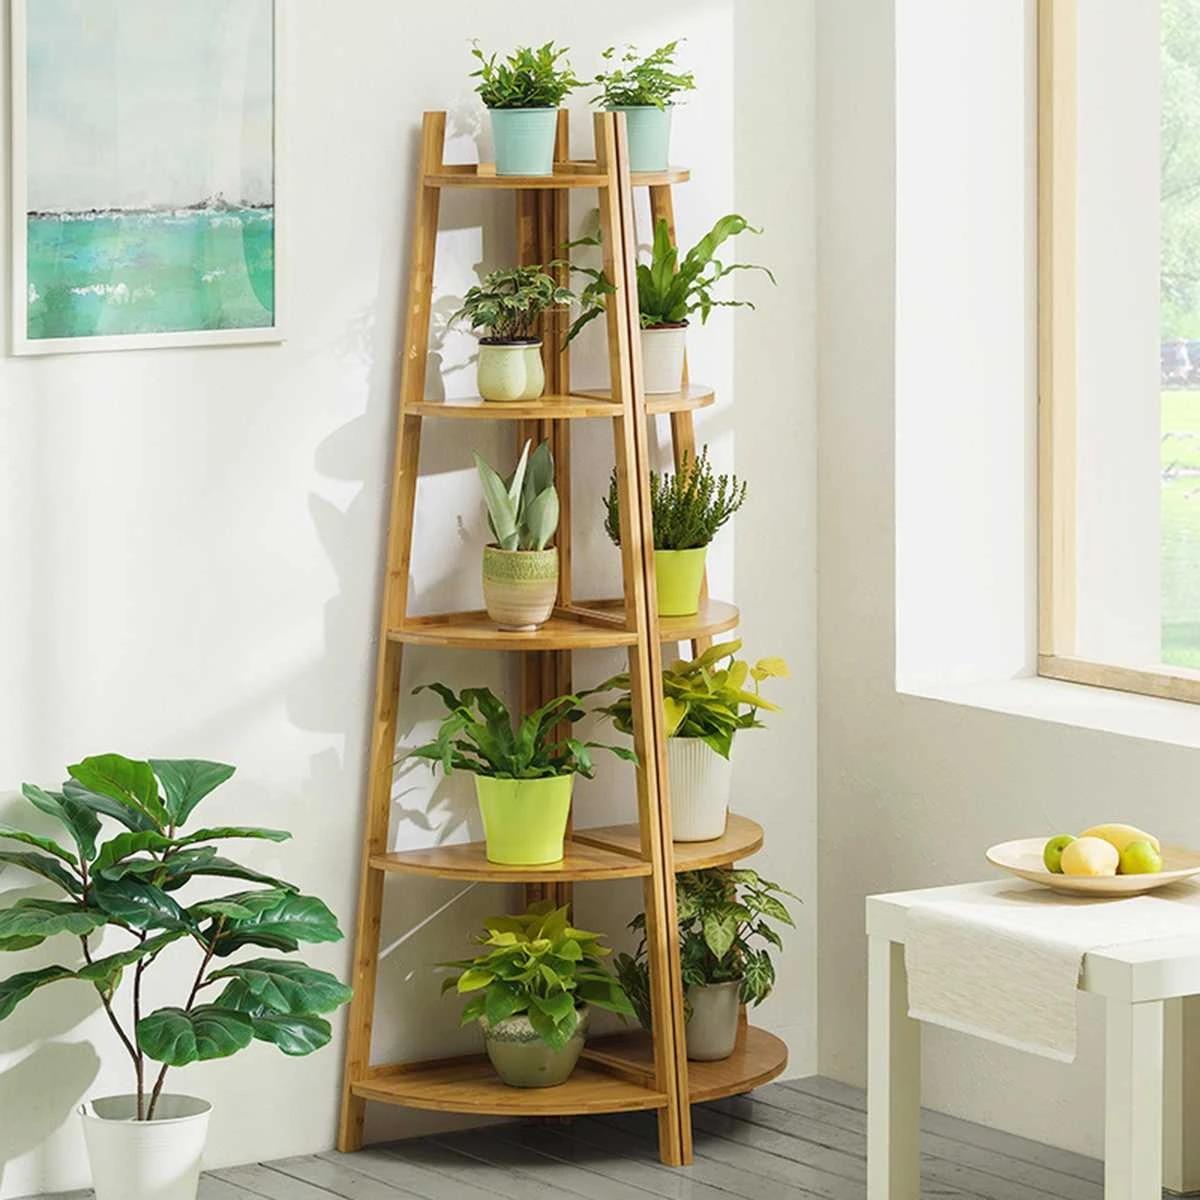 8/8 Tier Bamboo Plant Stand Flower Patio Garden Planter Pot Stand Shelf  Multi Tier Bonsai Display Outdoor Indoor Living Room